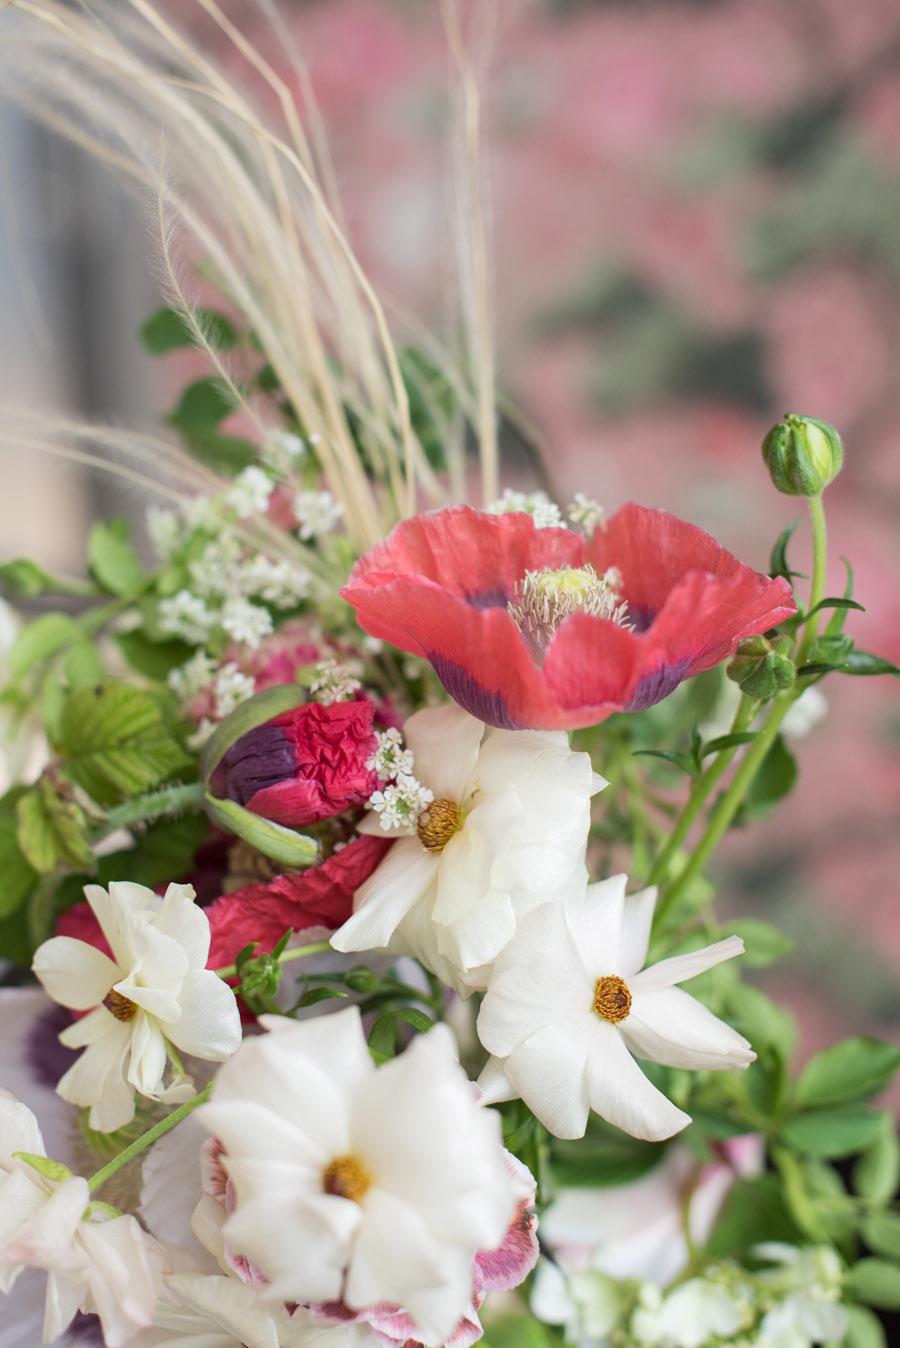 floral wedding ideas at Millbridge Court on English Wedding - photo credit Julie Michaelsen Photography (31)